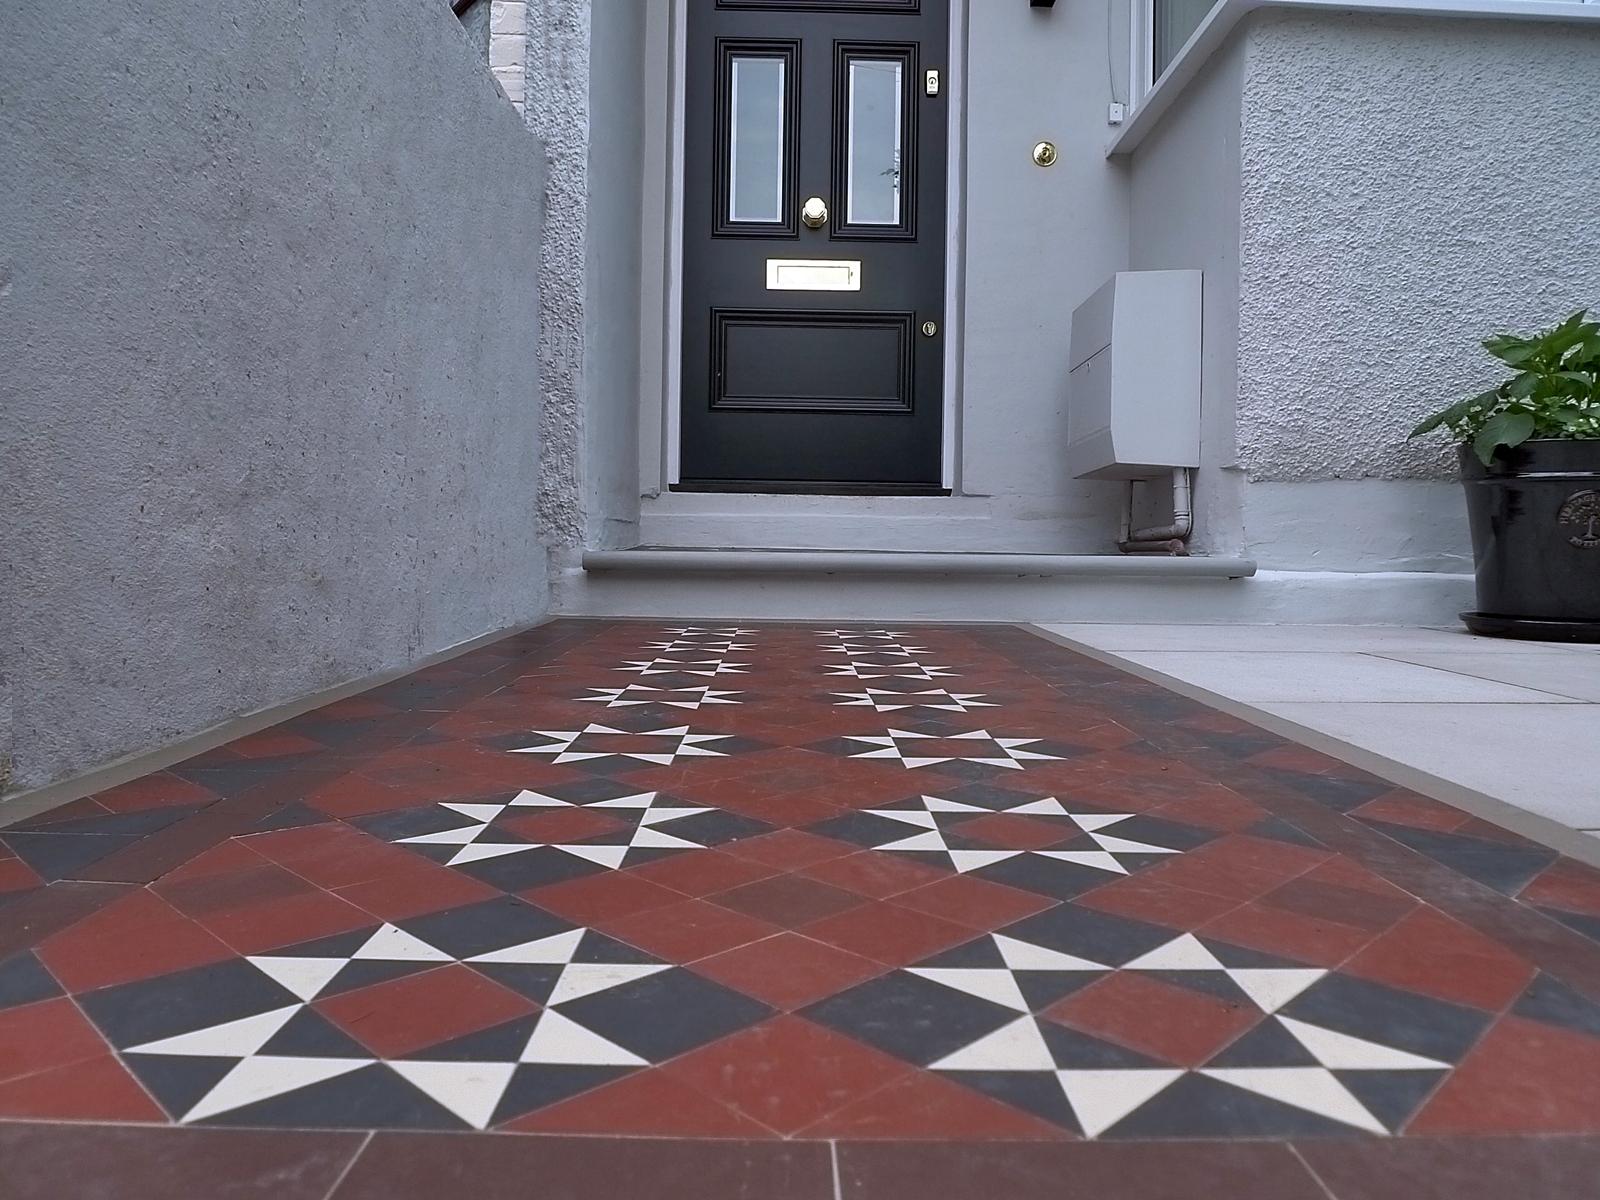 victorian edwardian mosaic tile path red black and white wandsworth earlsfield southfields wimbledon putney london